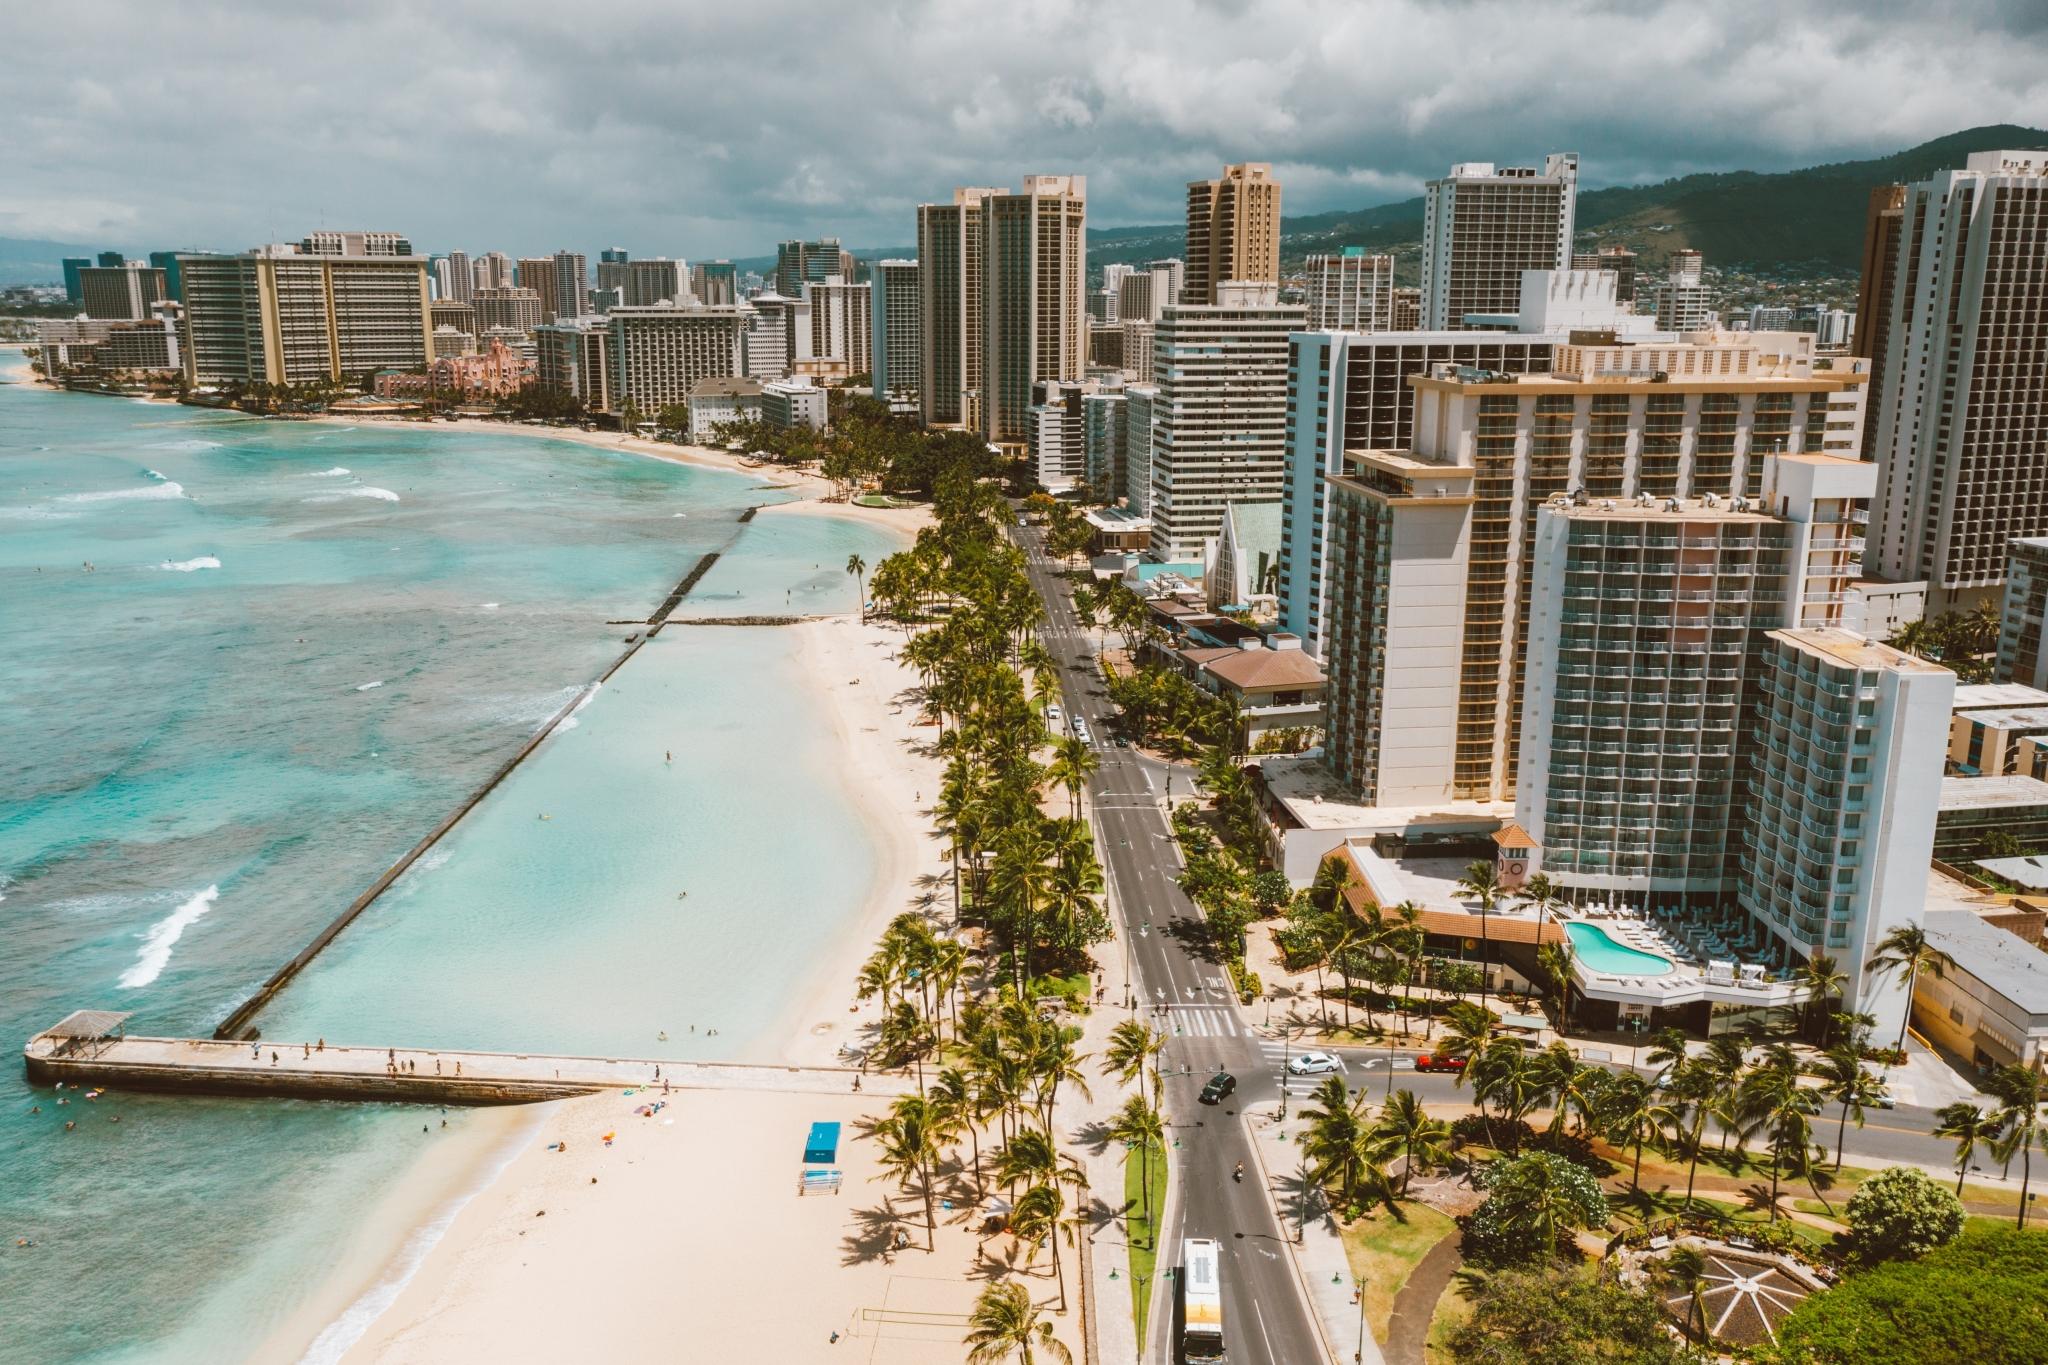 Coastline in Honolulu, Hawaii